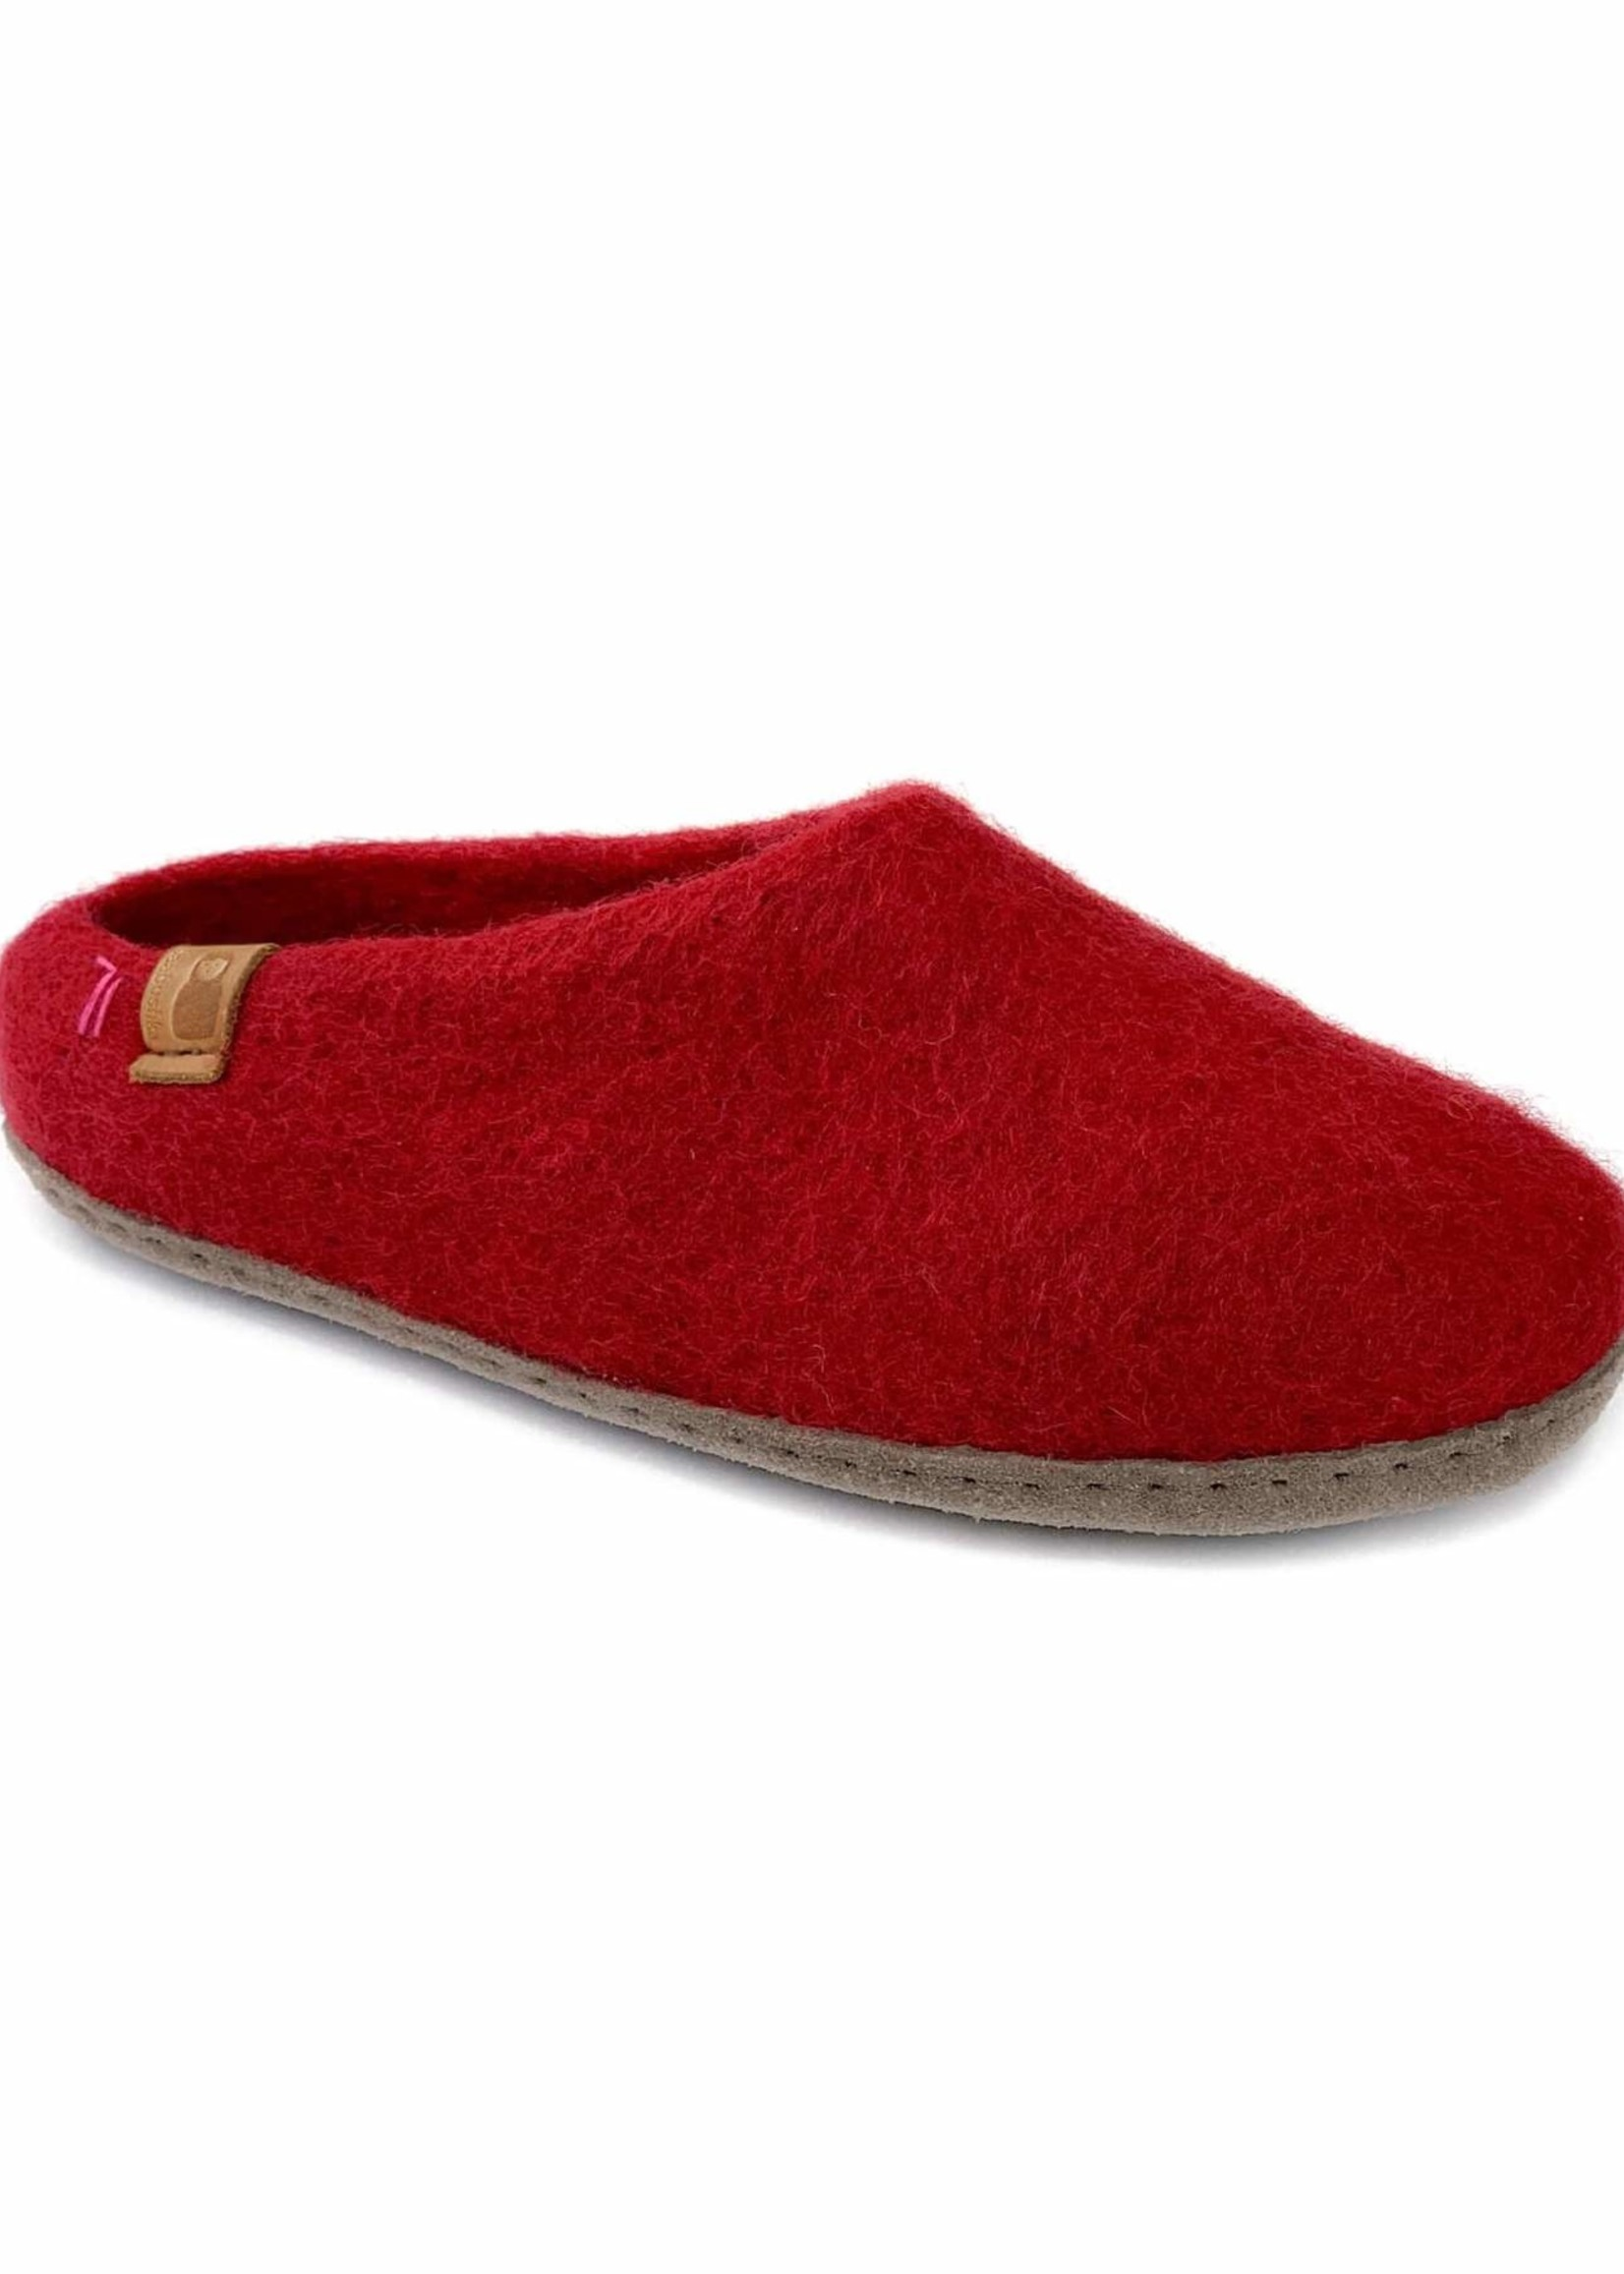 Baabushka Red Wool Slippers